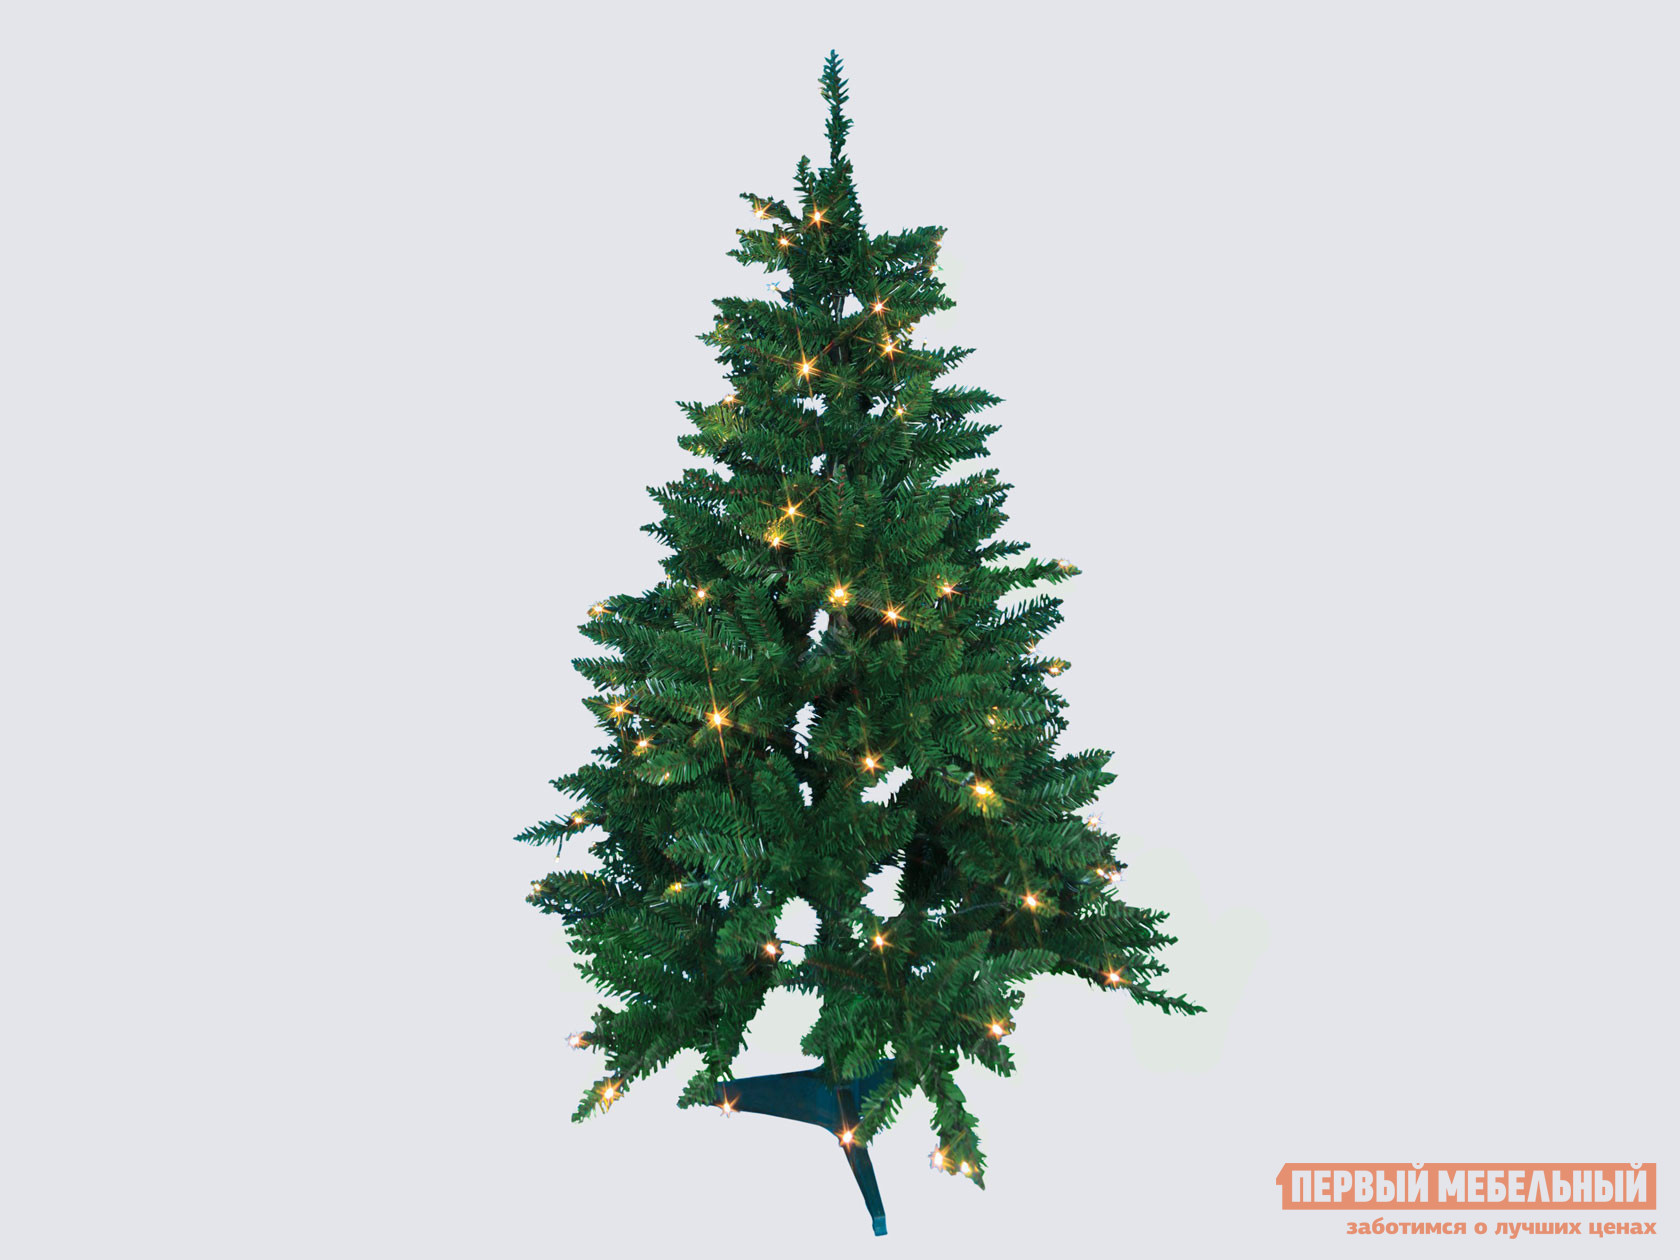 Светодиодная фигура  ULD-T0612-100/SBA WARM WHITE IP20 XMAS TREE Зеленый